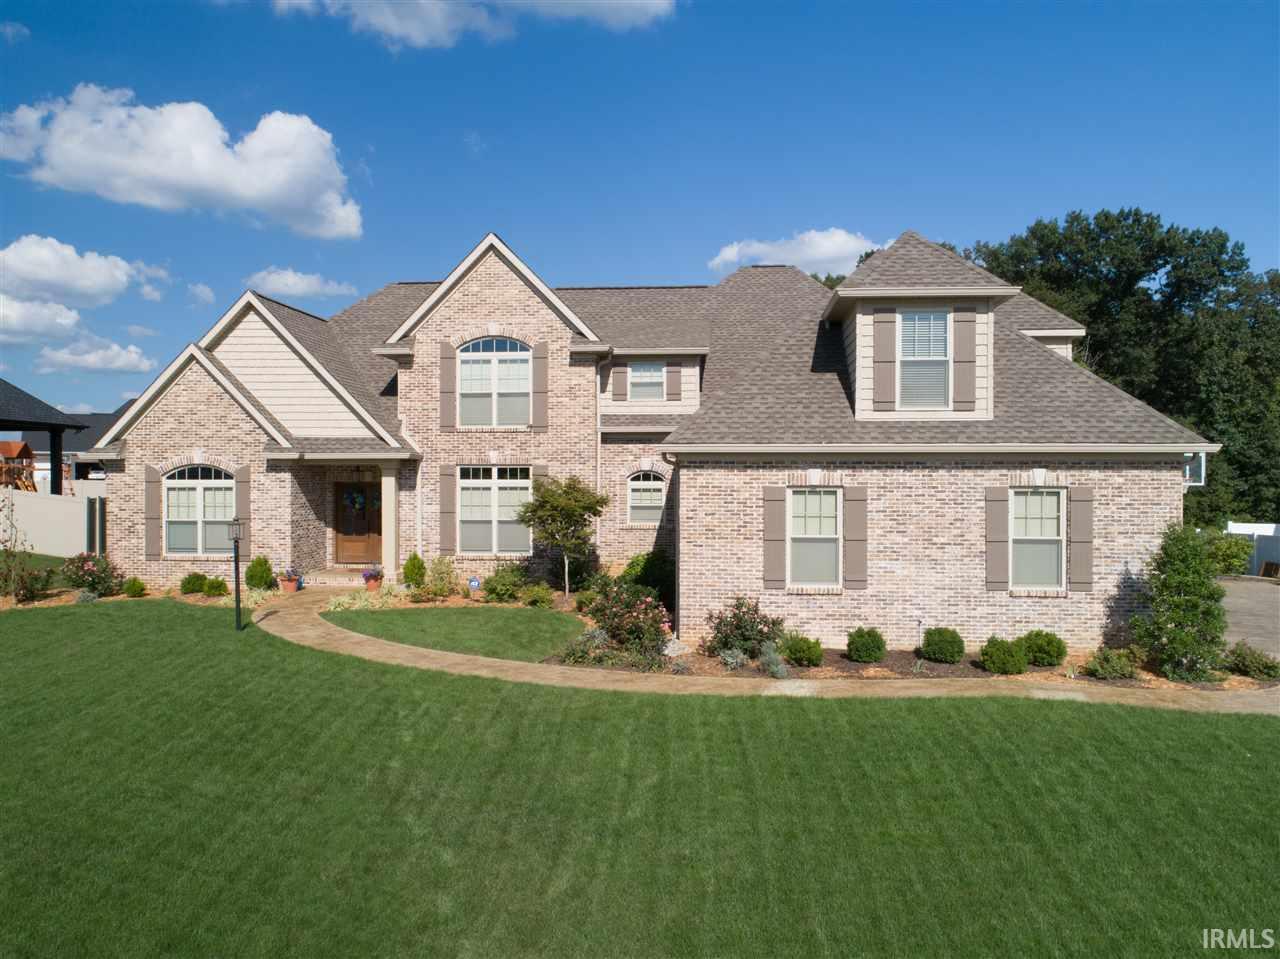 8849 Claiborne, Evansville, IN 47725